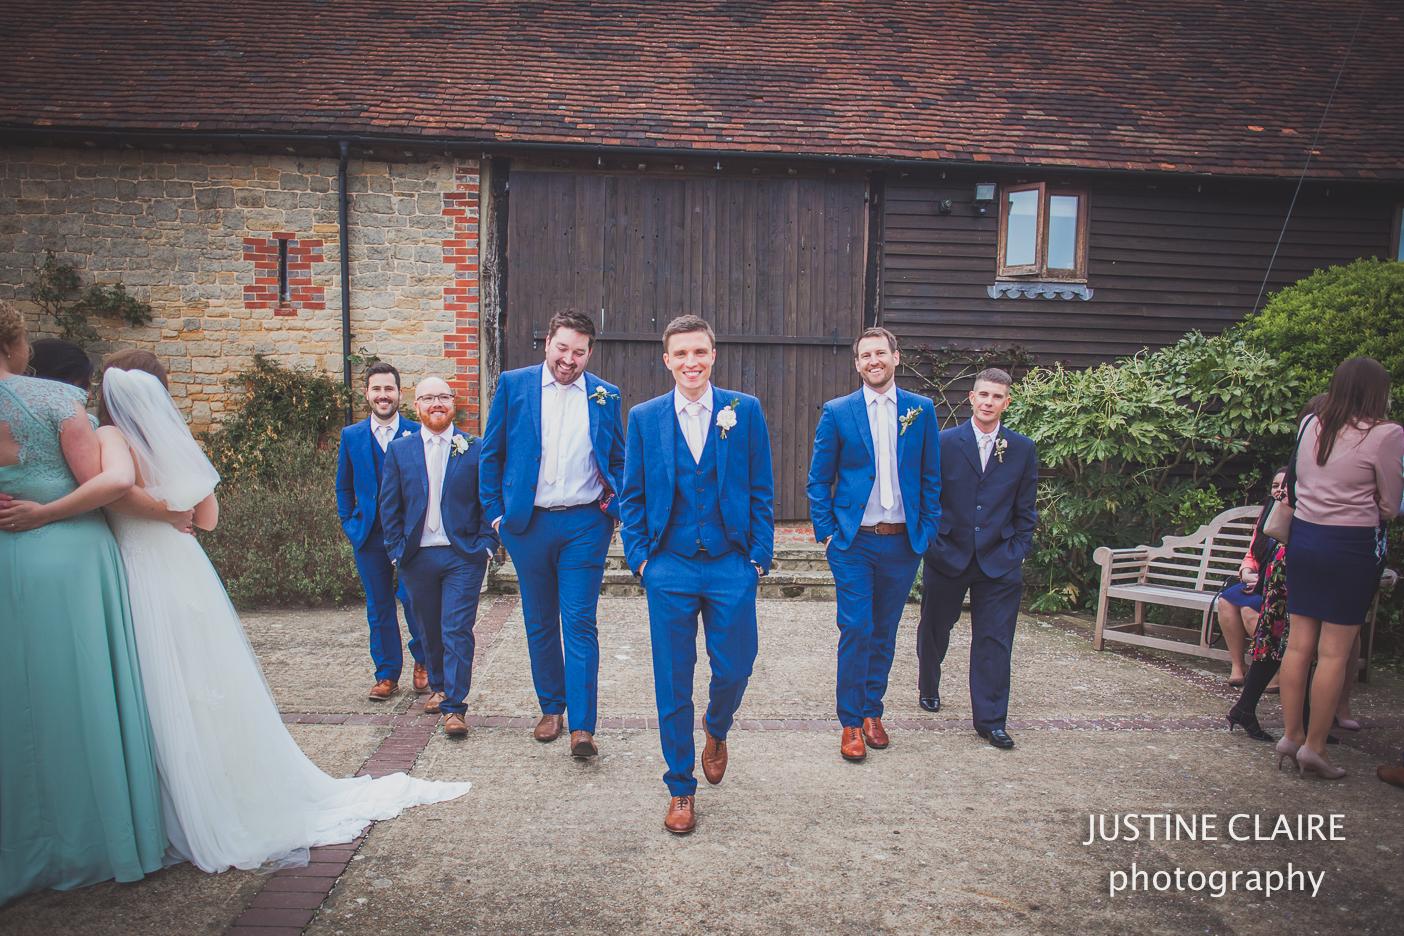 Fitzleroi Fittleworth petworth Billingshurst farm Wedding Photography by Justine Claire photographer Arundel Worthing Brighton-38.jpg